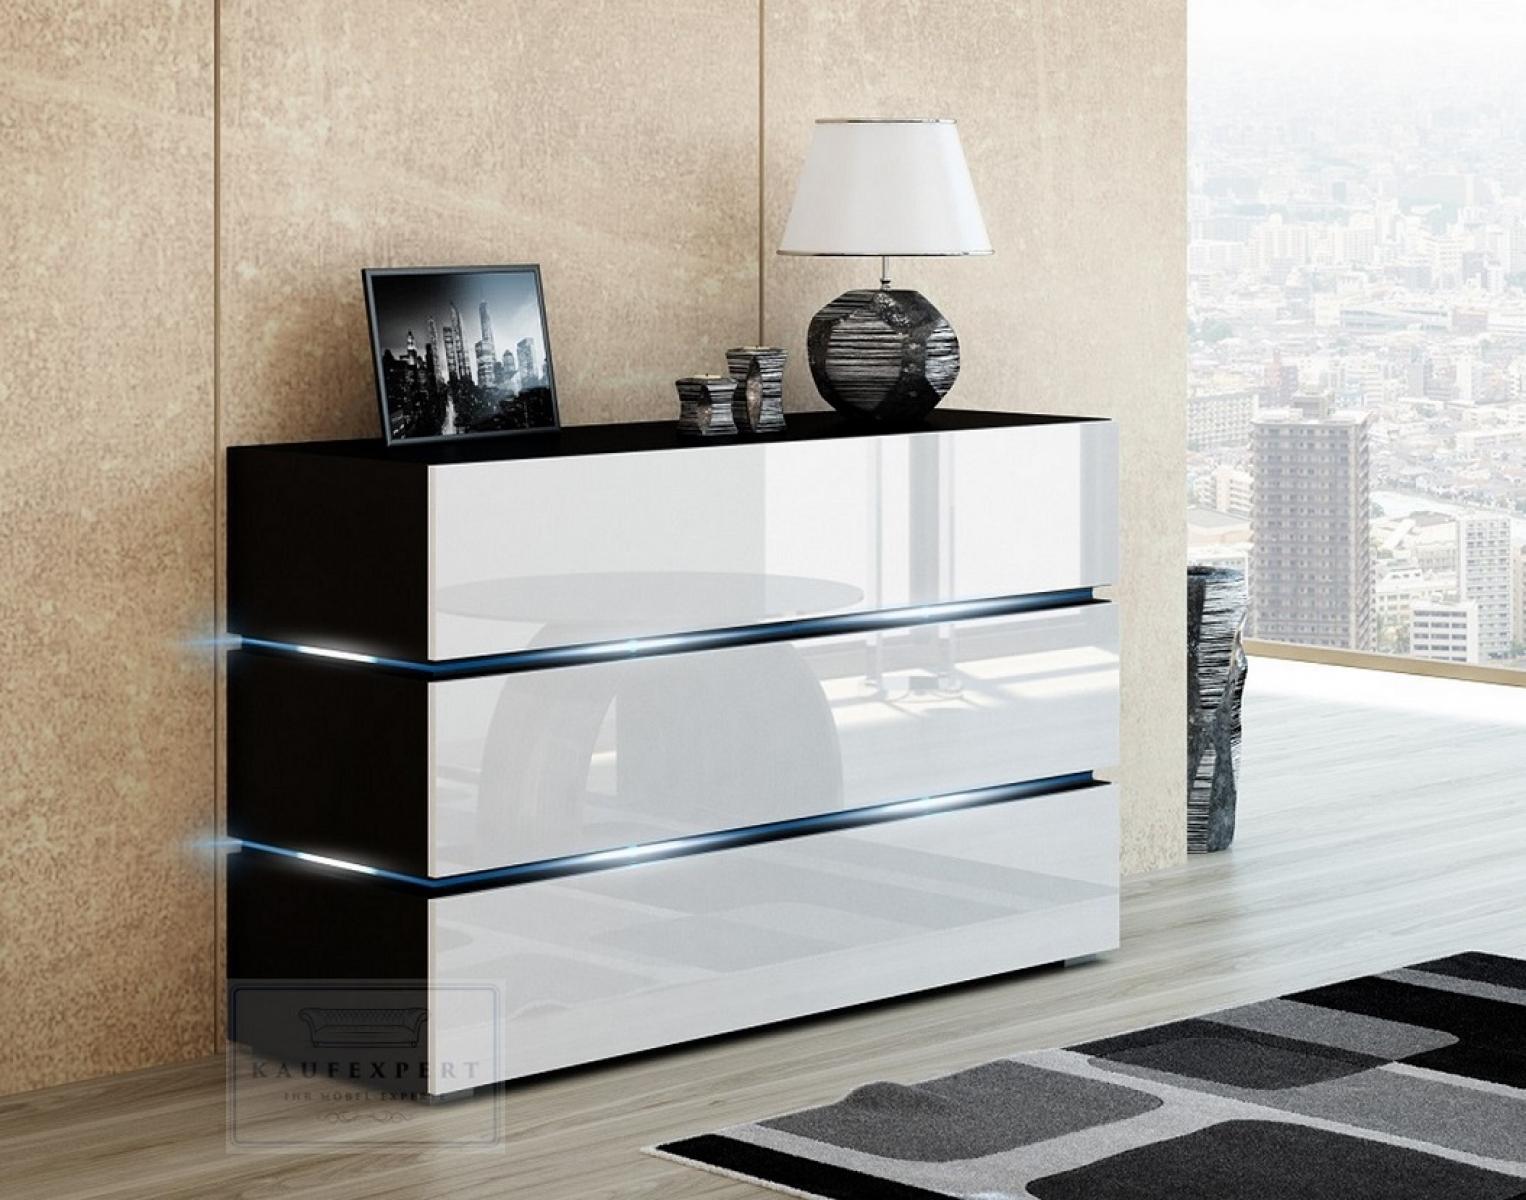 kommode shine sideboard 120 cm weiss hochglanz schwarz led beleuchtung modern design tv mobel anrichte sigma